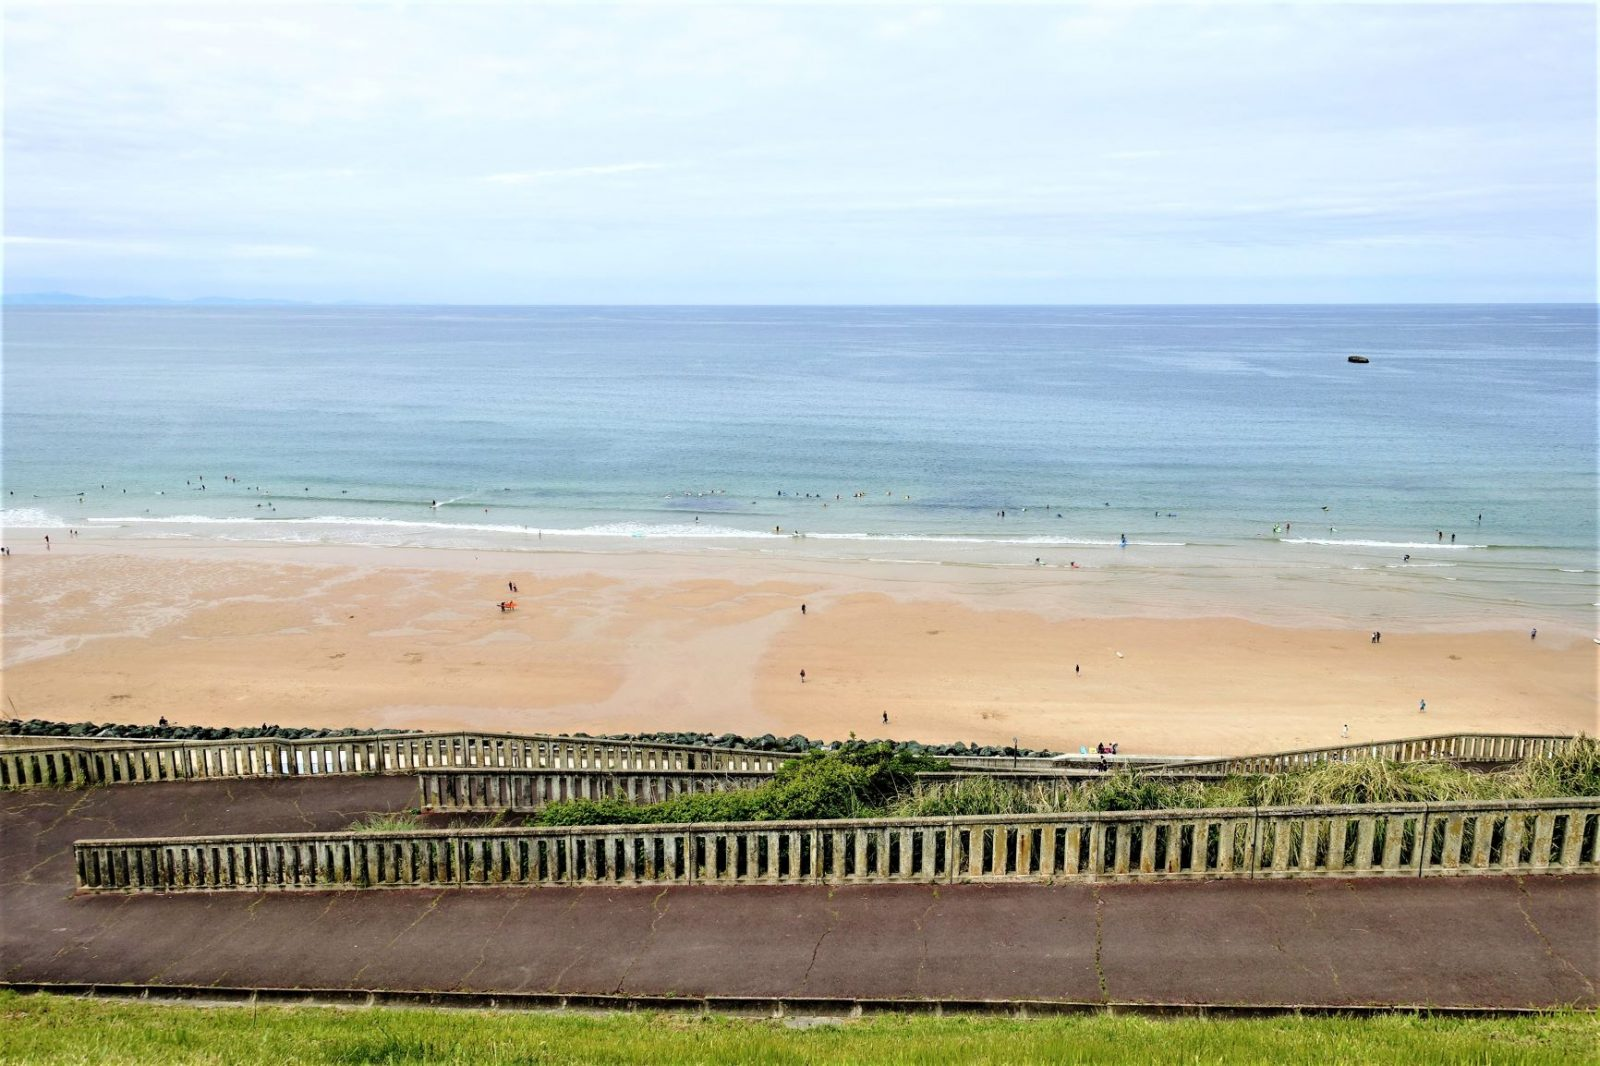 Biscayabukta og den ekslusive byen Biarritz